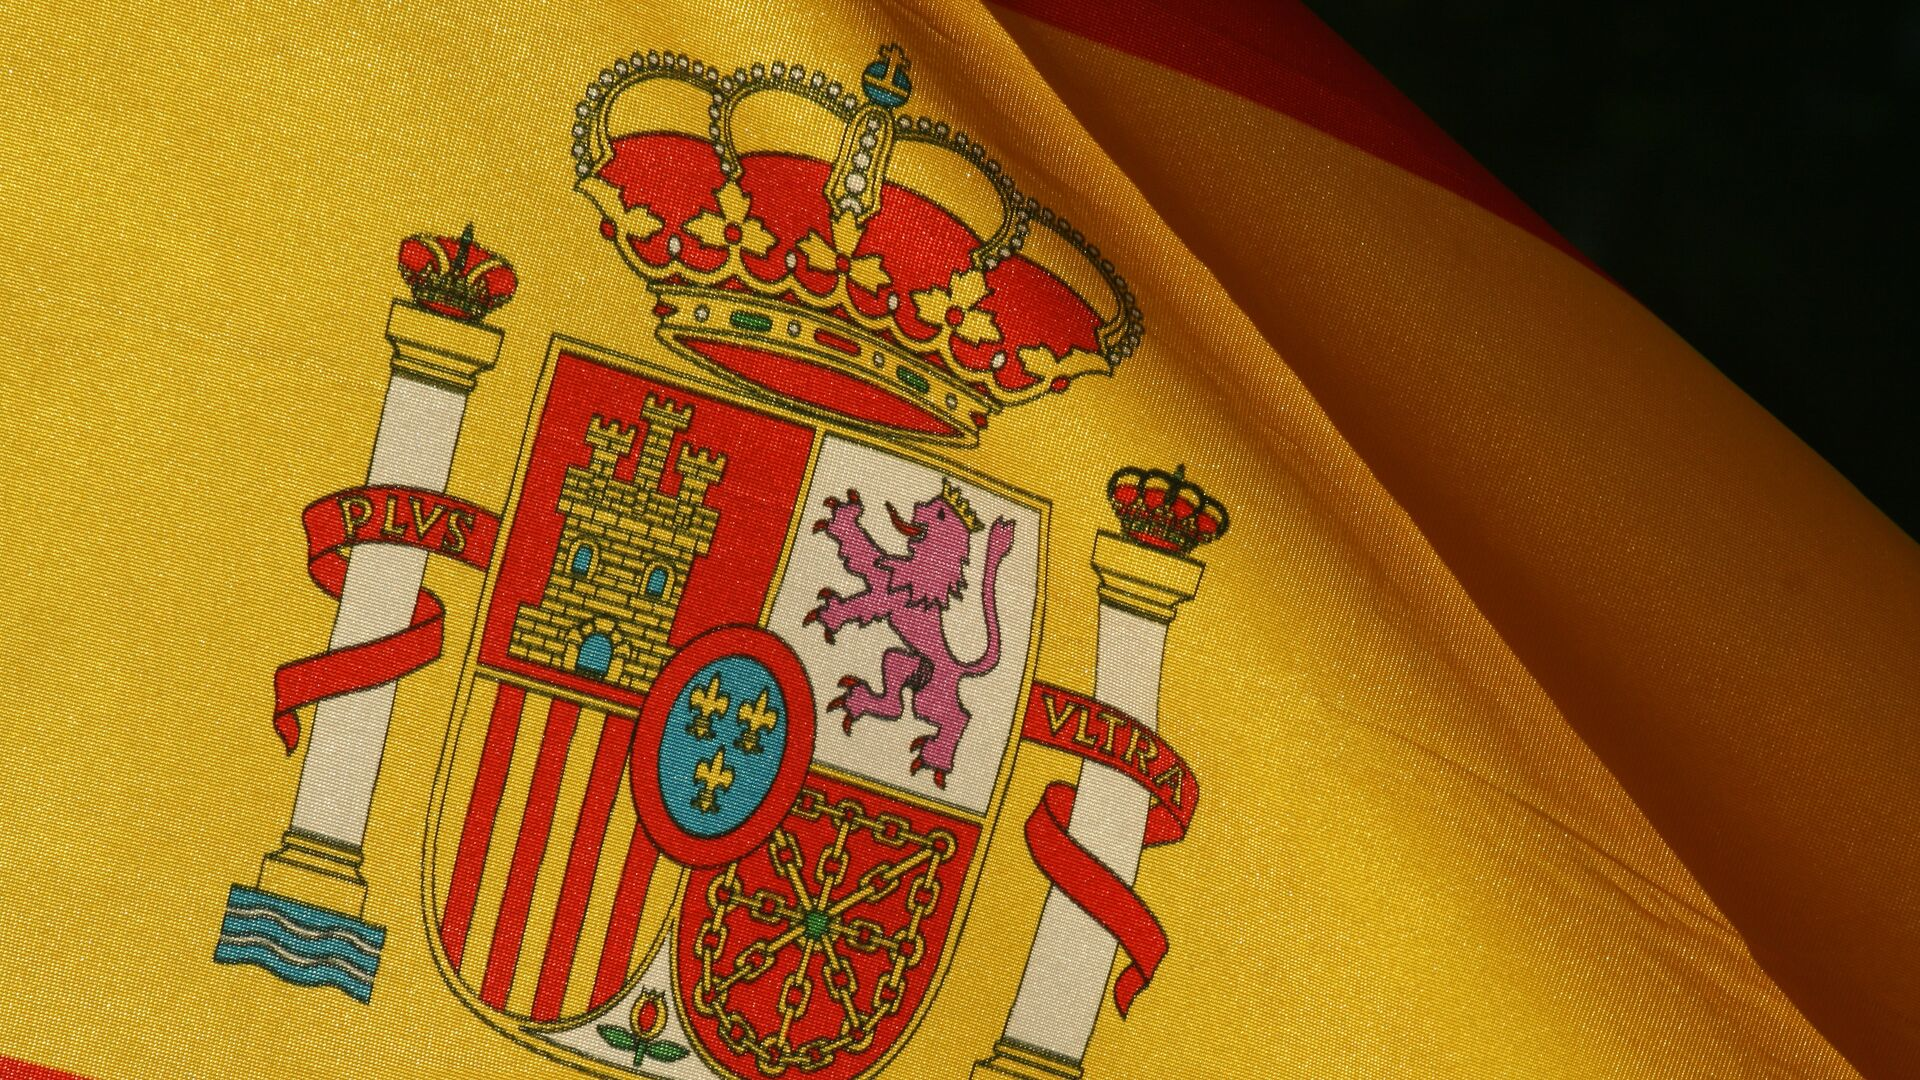 Bandera de España - Sputnik Mundo, 1920, 28.10.2020